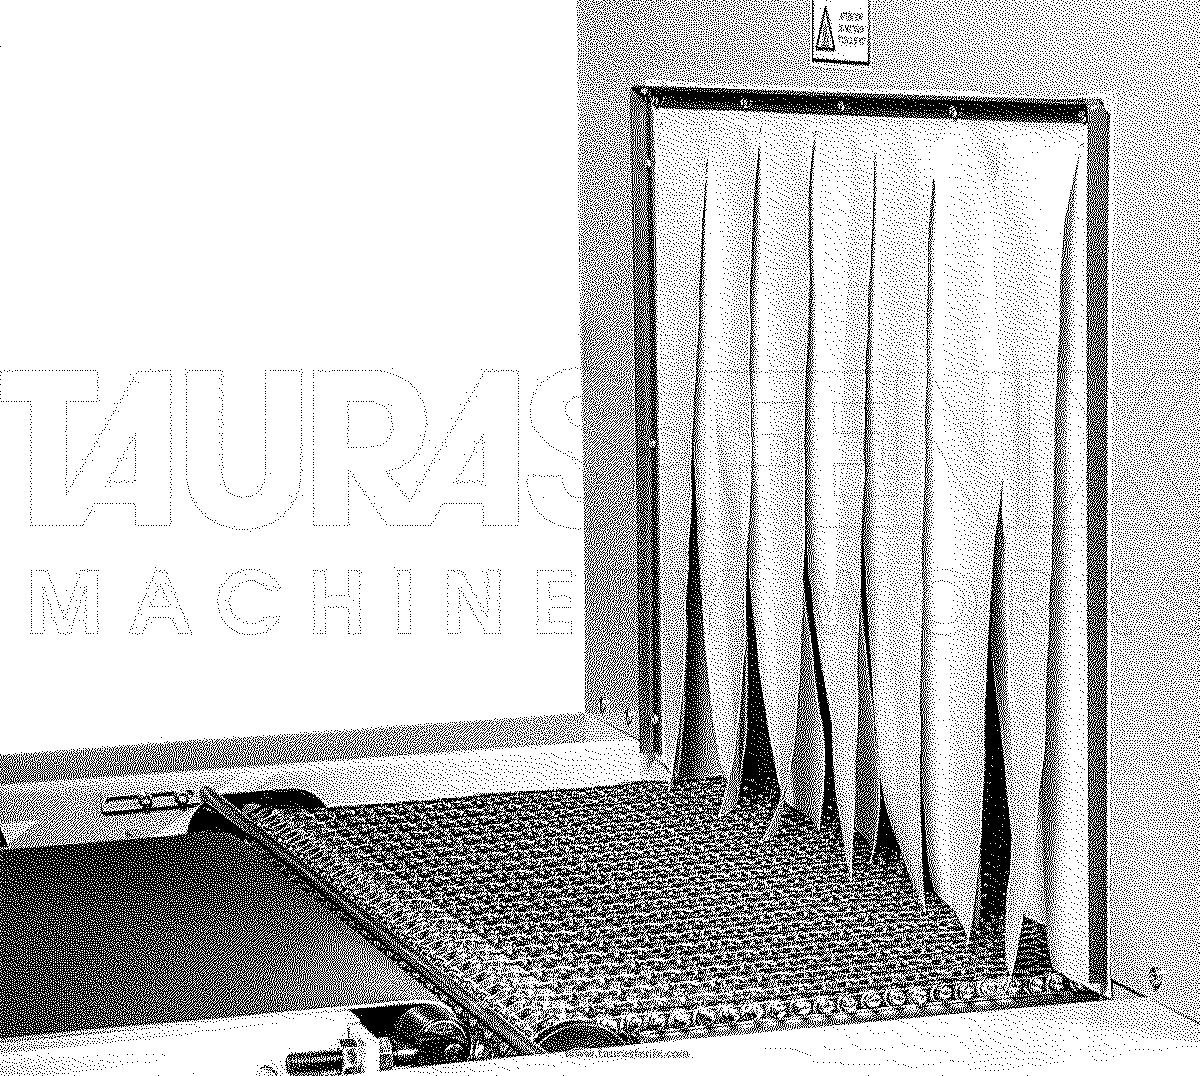 Термоусадочный аппарат ТУРБОПАК 254